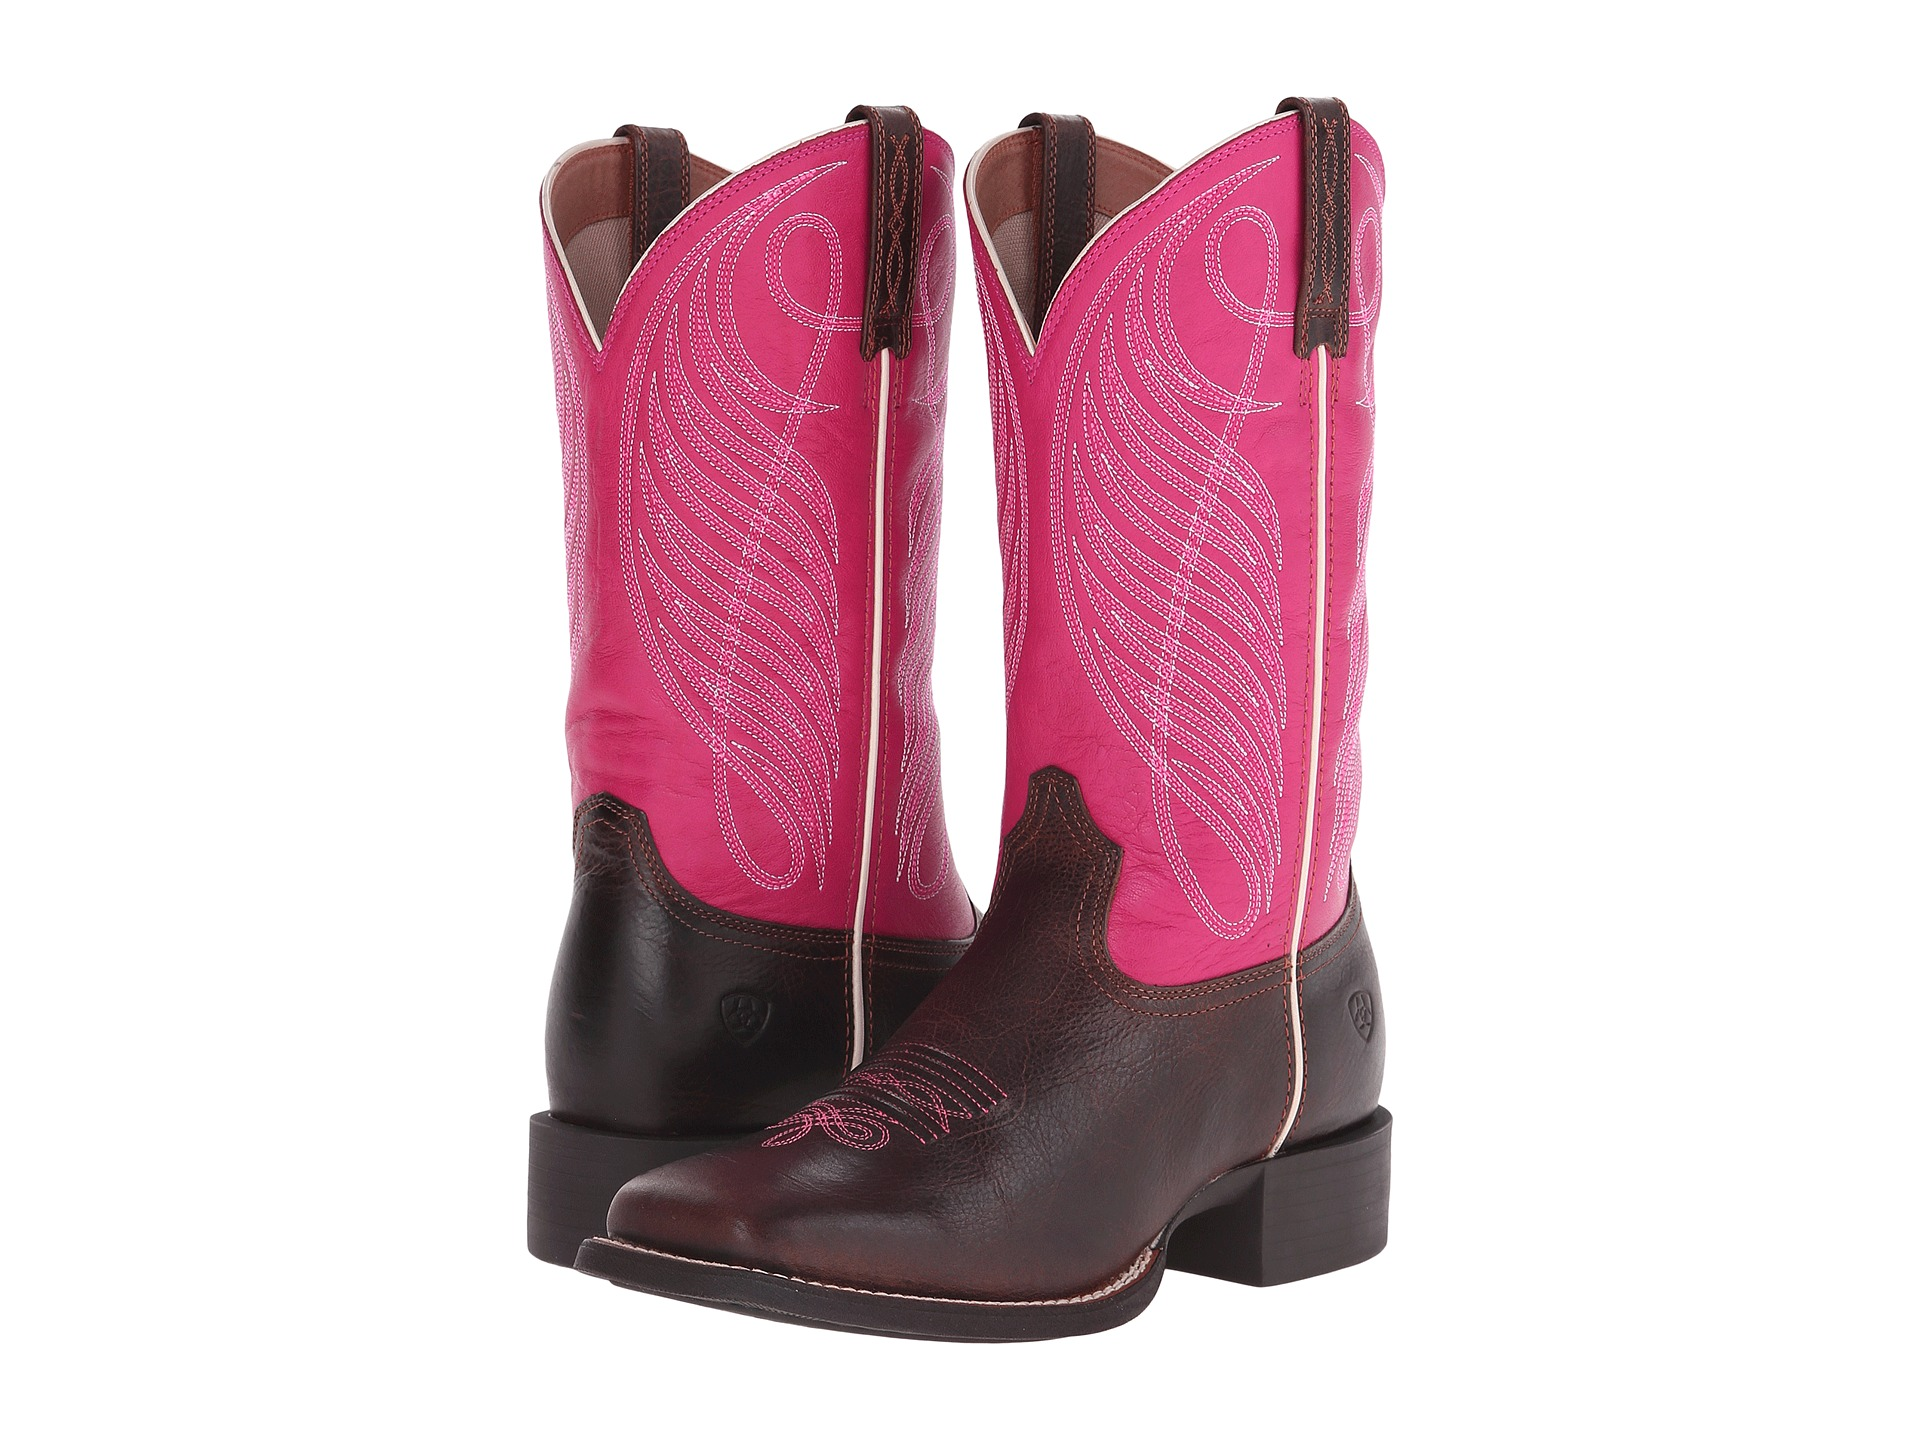 Ariat, Boots, Women at 6pm.com